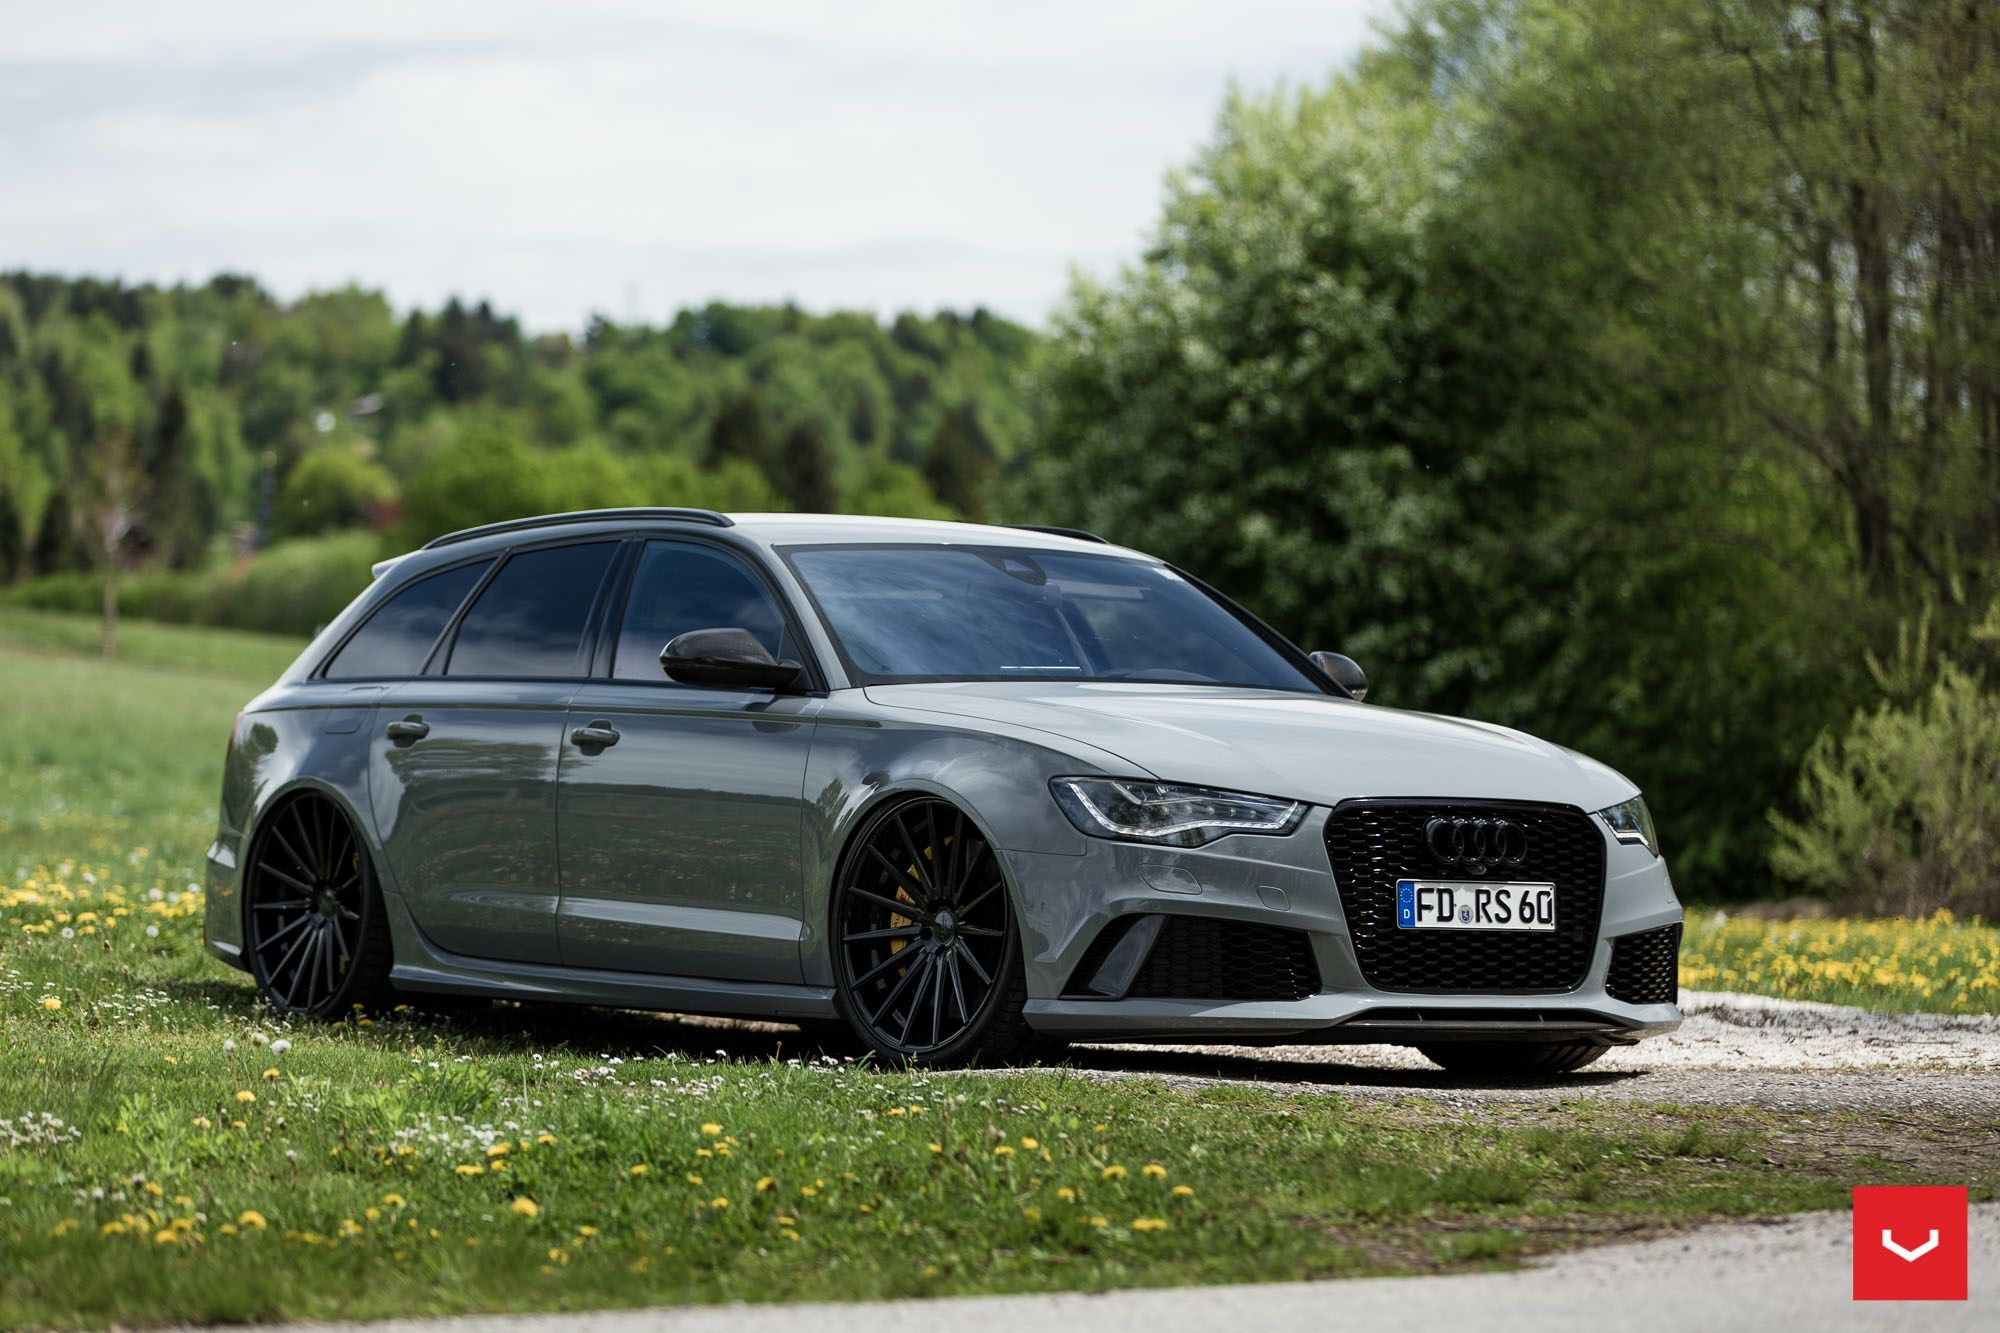 Audi rs6 avant mat grey with black rims explore classy wheels and rims pinterest schlitten